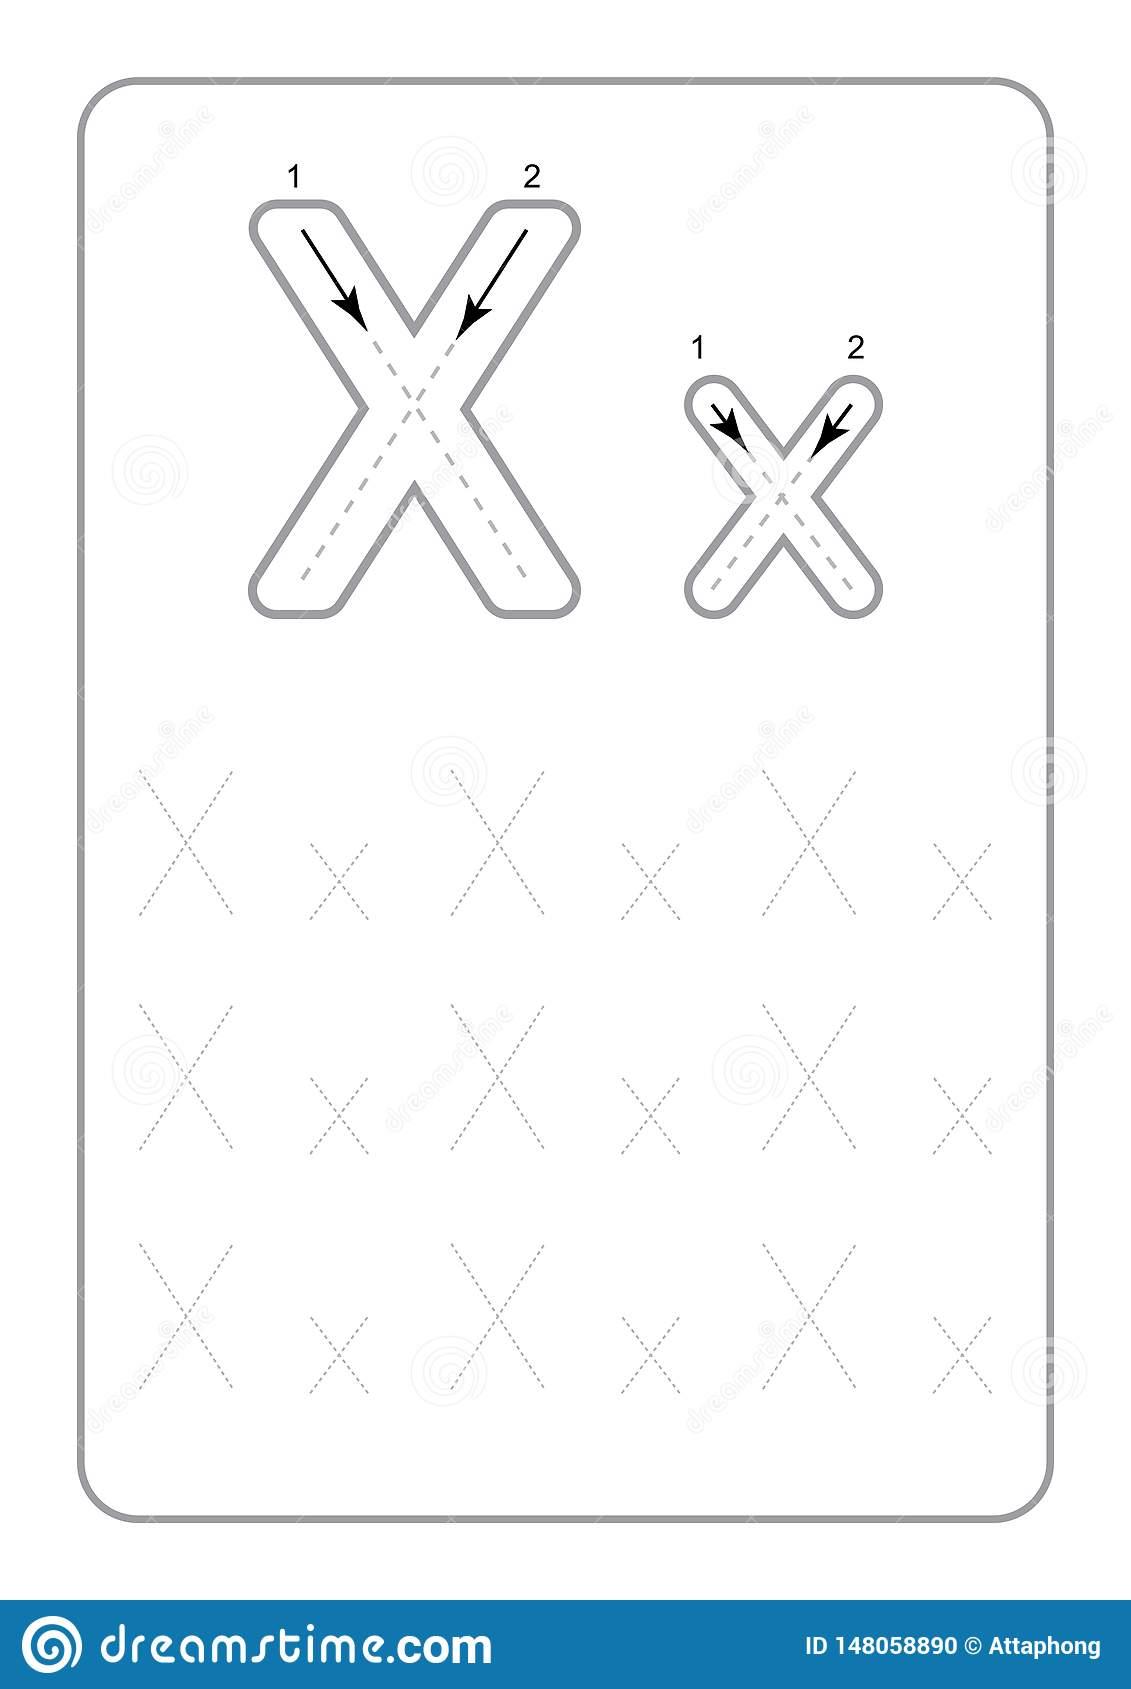 Kindergarten Tracing Letters Worksheets Monochrome Tracing in Tracing Letters Worksheets For Kindergarten